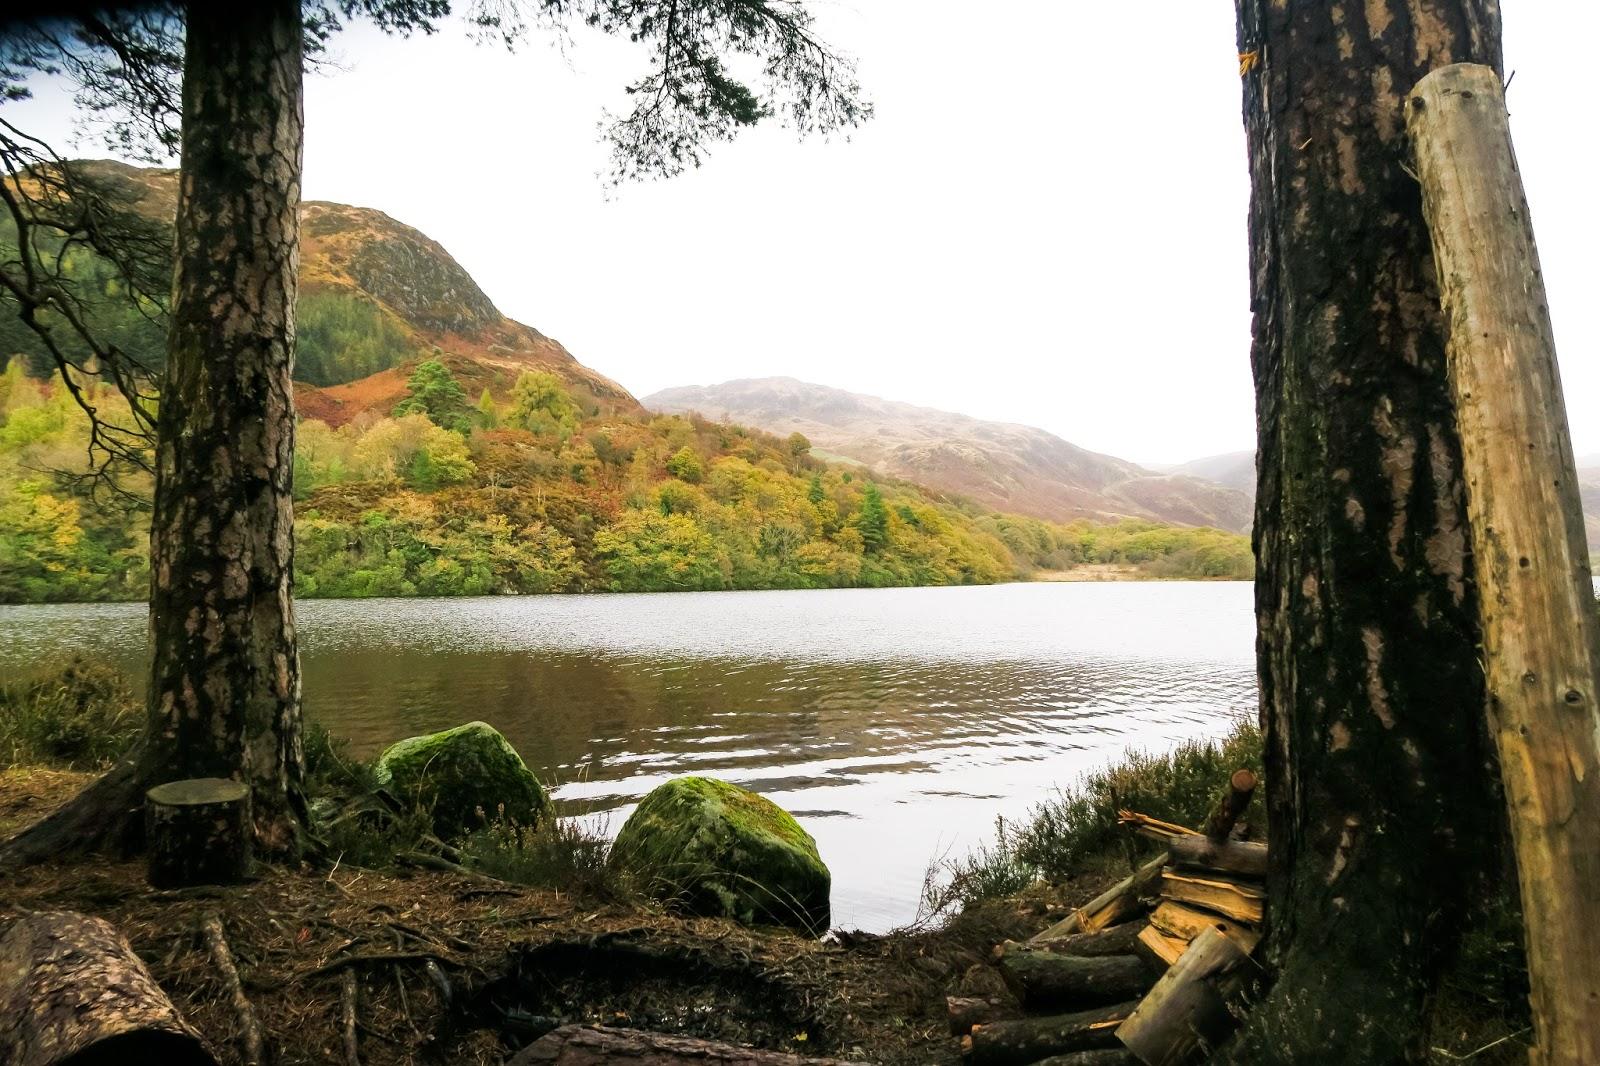 Wood walk galloway forest scotland liquid grain river liquidgrain